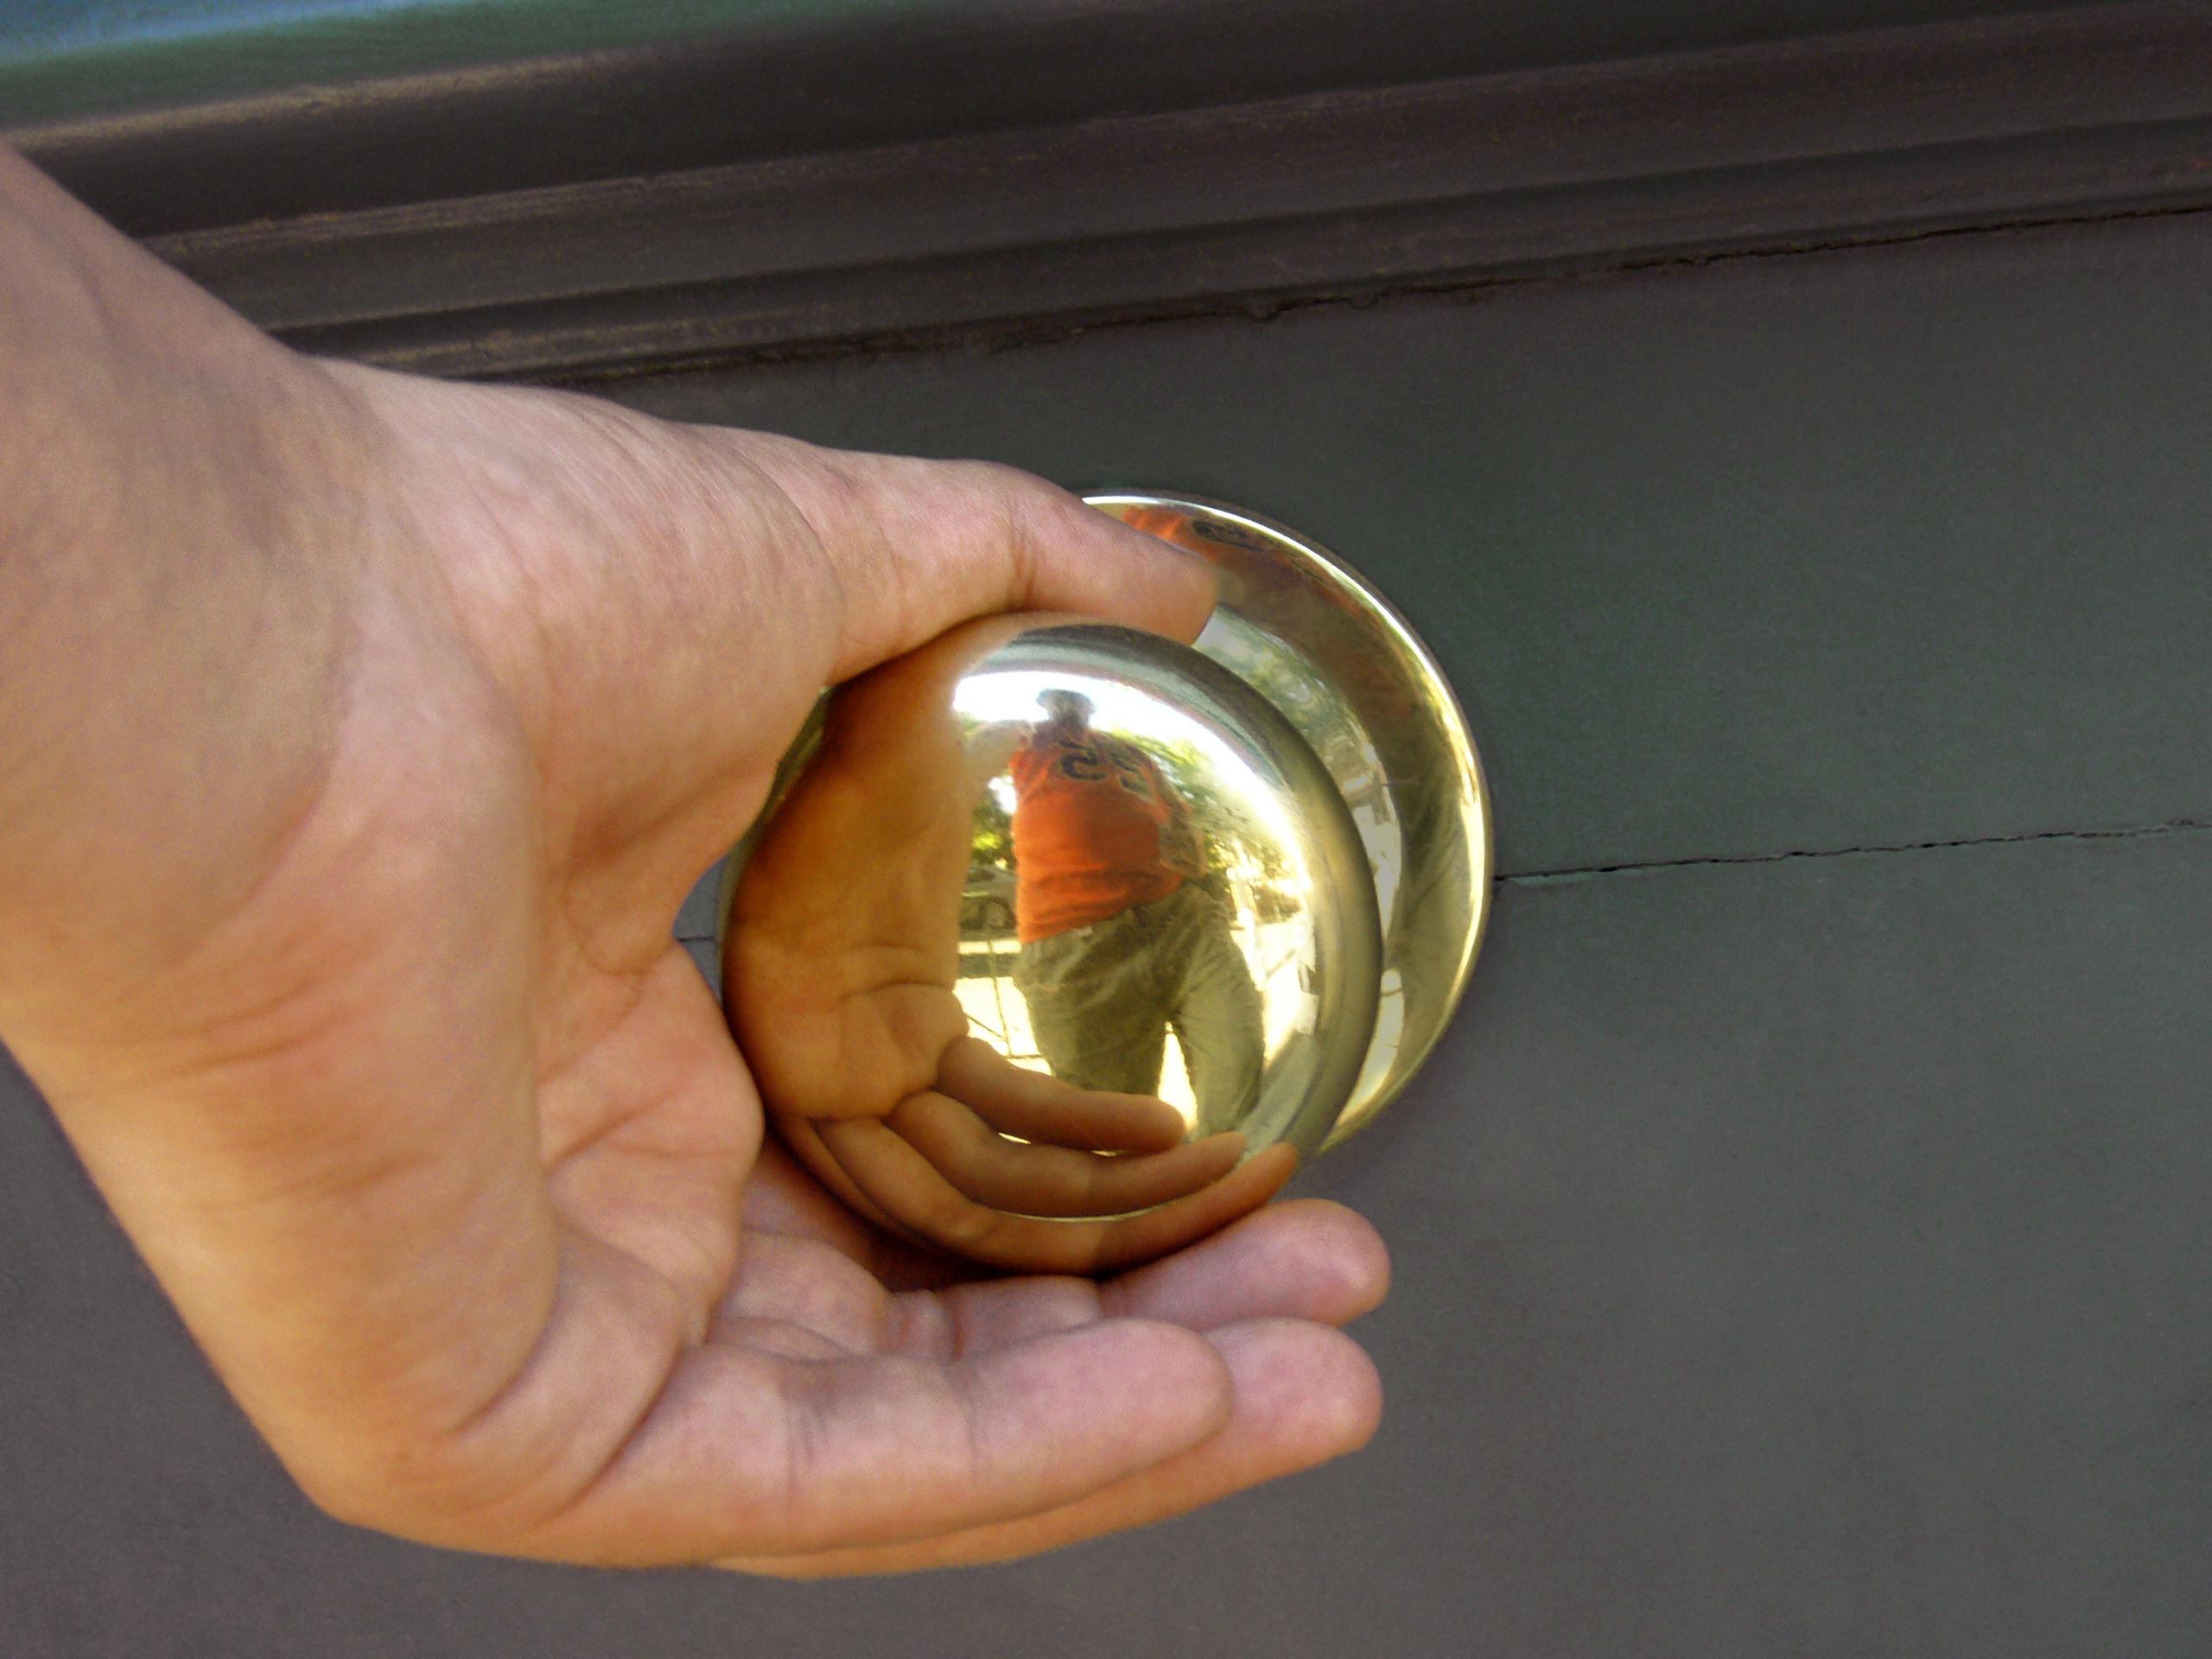 When can a Florida Landlord enter the property